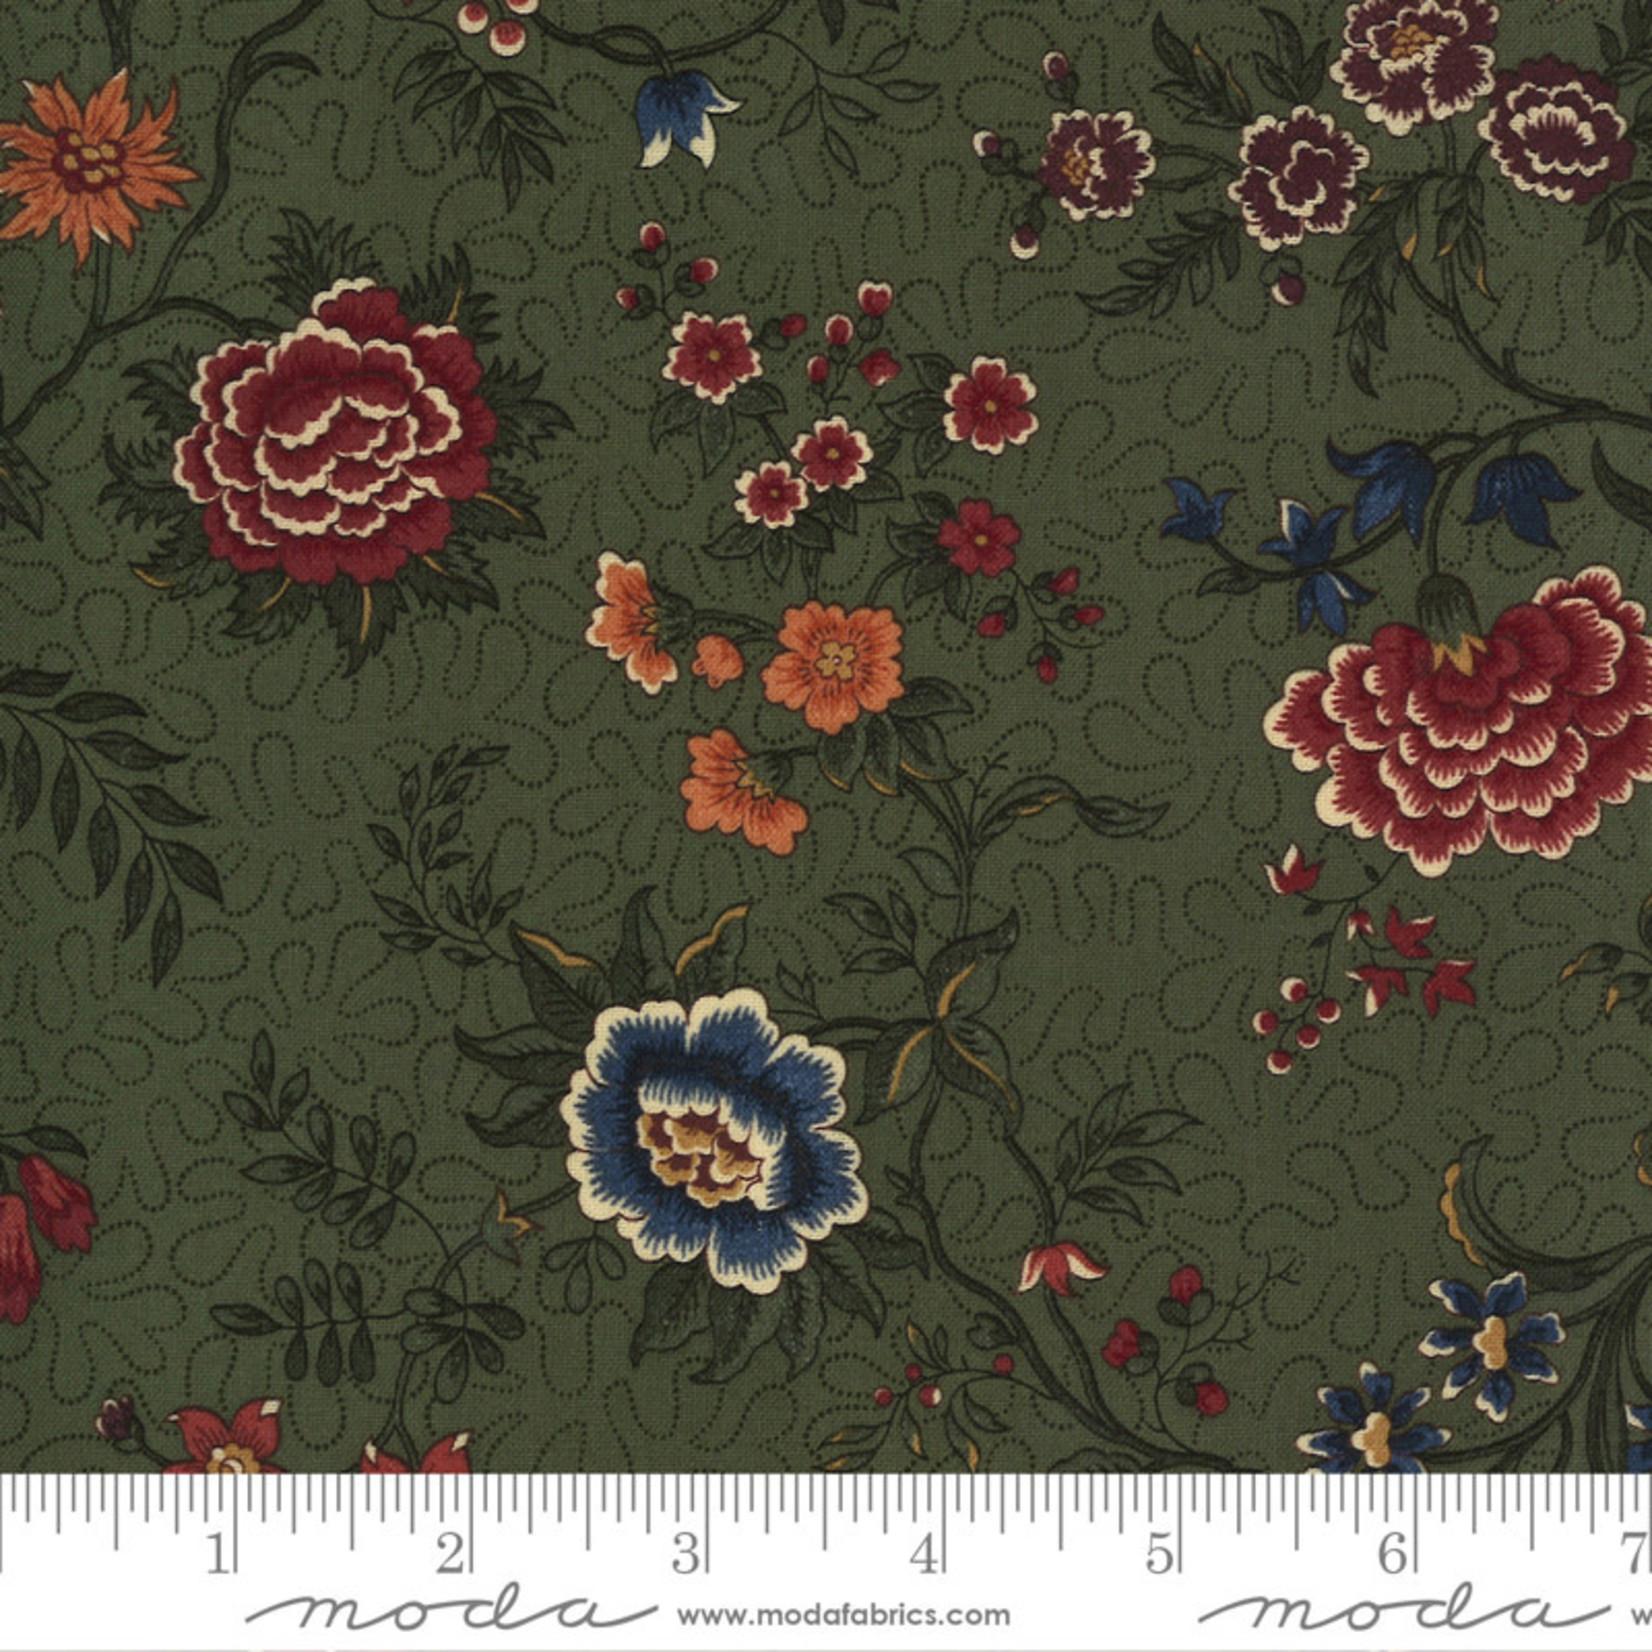 Kansas Troubles Quilters Prairie Dreams, Prairie Flowers Florals, Green 9650 15 $0.20 per cm or $20/m